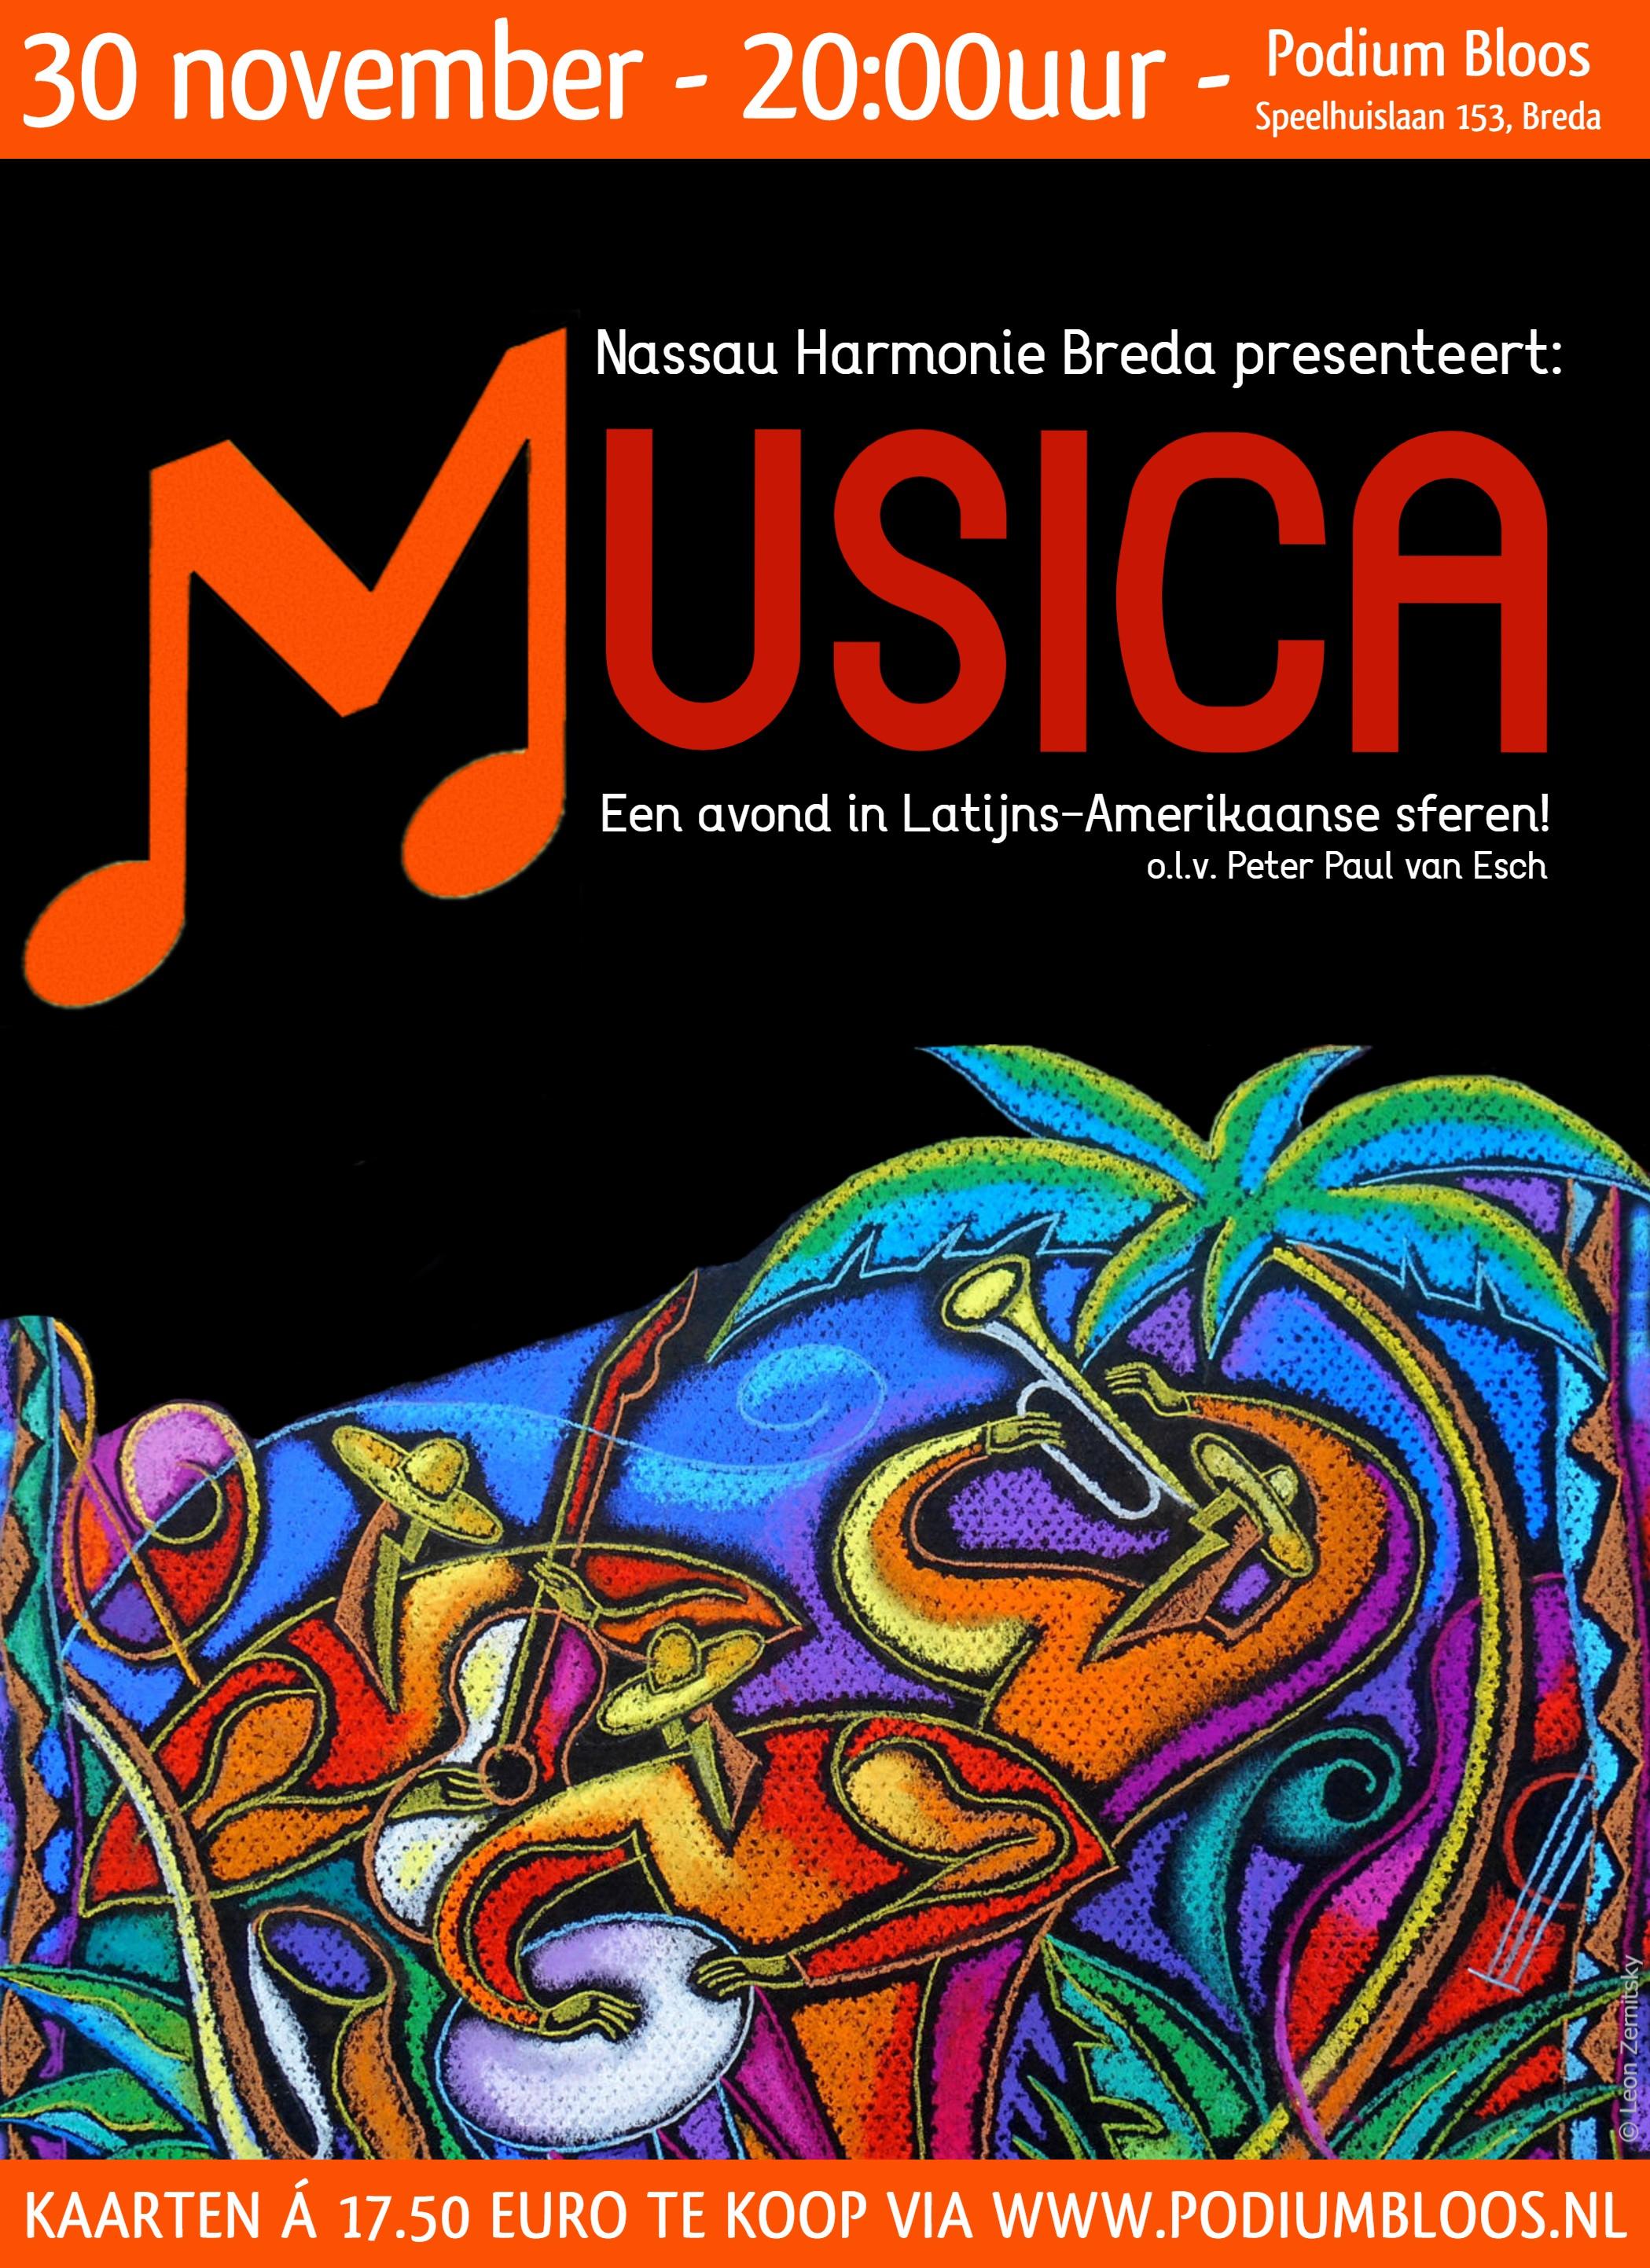 Nassau Harmonie Breda 30 november